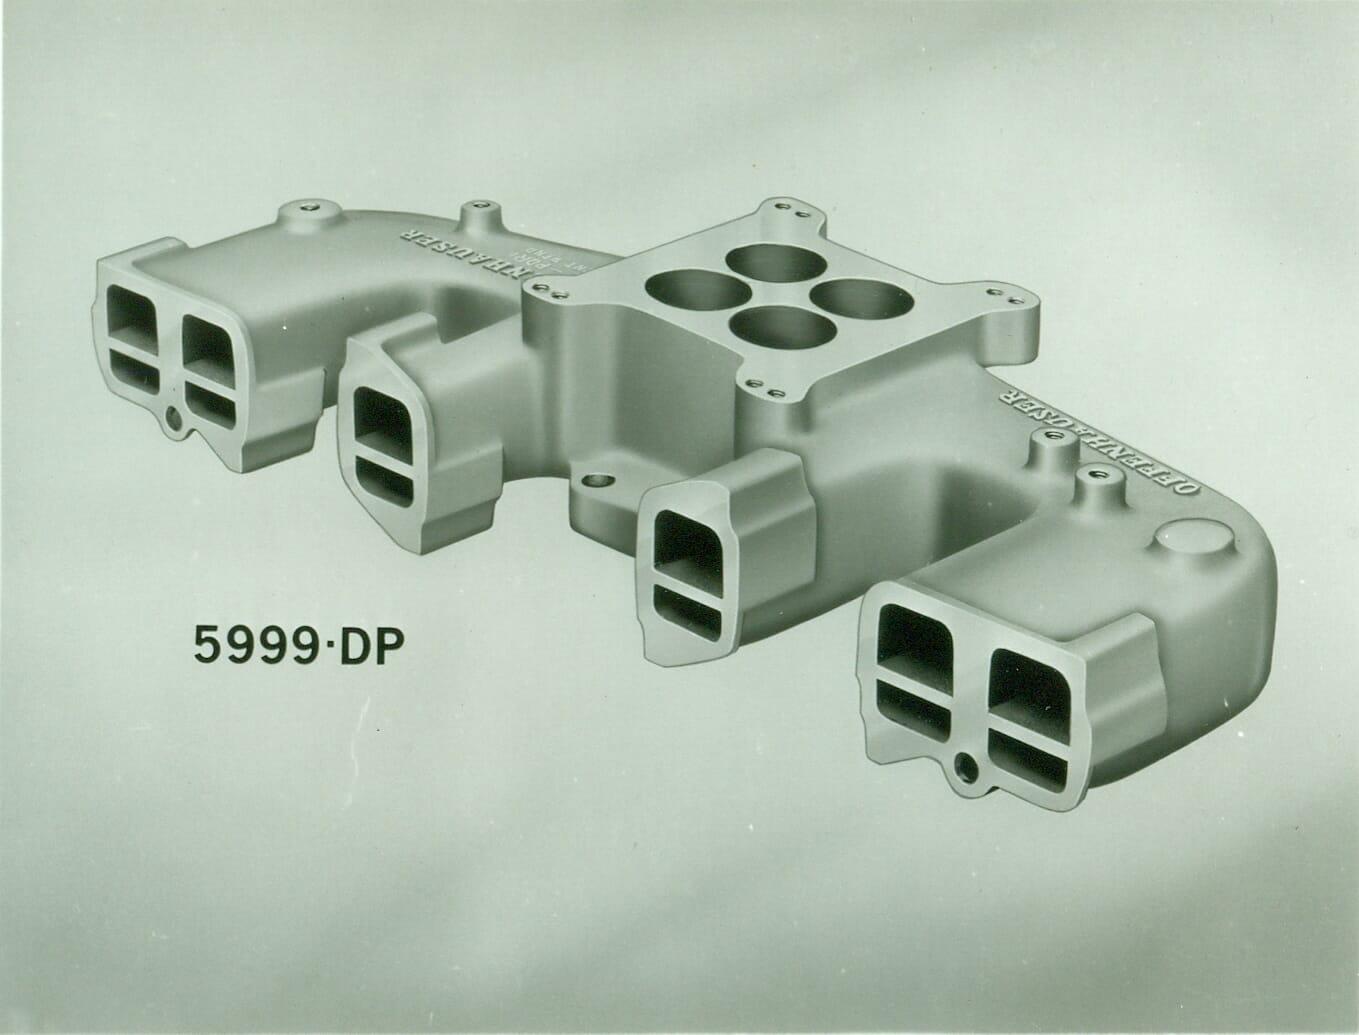 Offenhauser #5999DP Jeep/AMC 6 Cylinder Dual Port Manifold